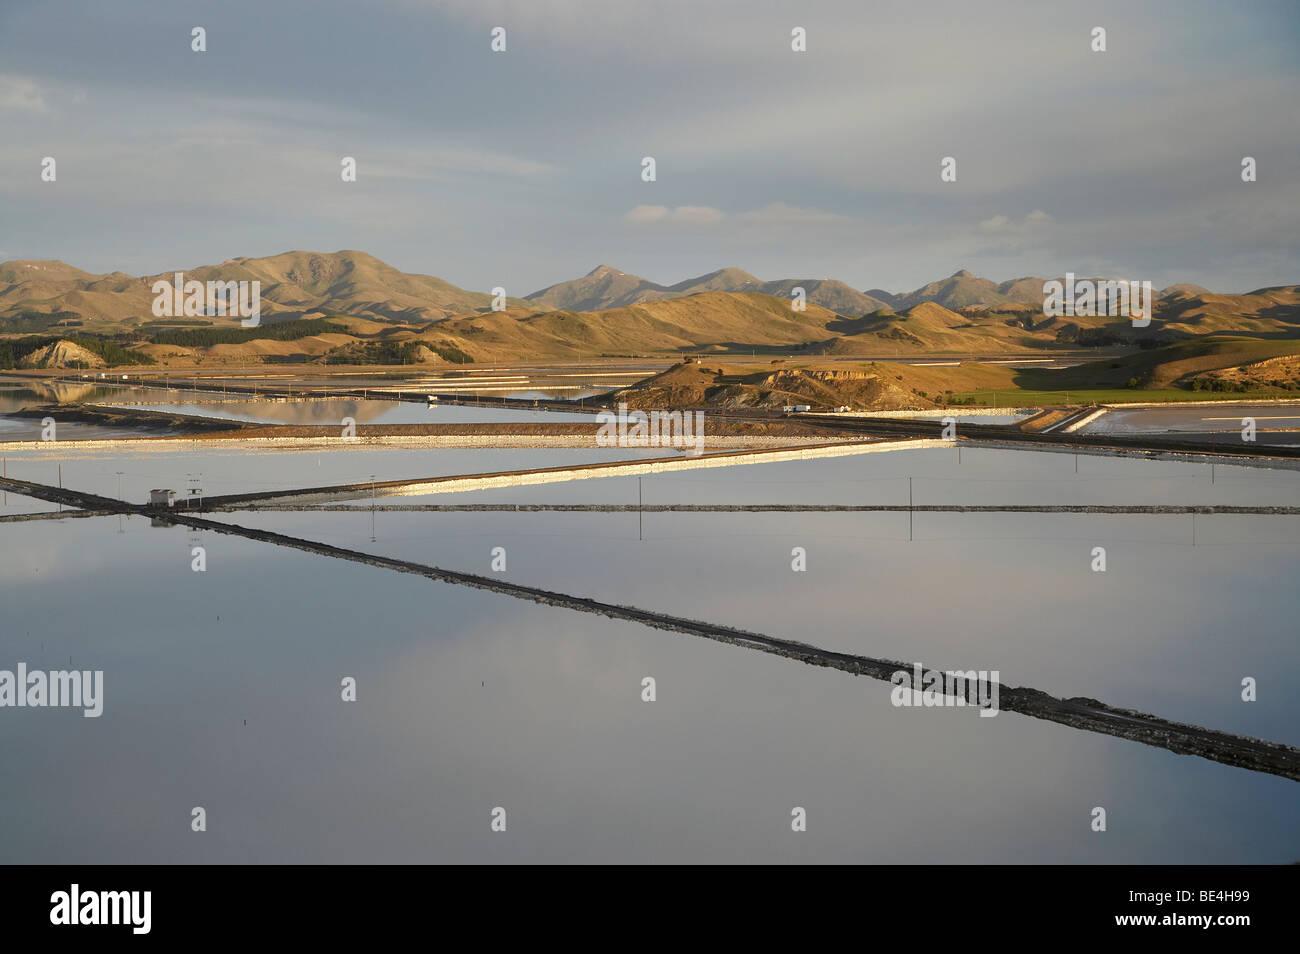 Evaporation Ponds (for Salt Works), Lake Grassmere, Marlborough, South Island, New Zealand - Stock Image